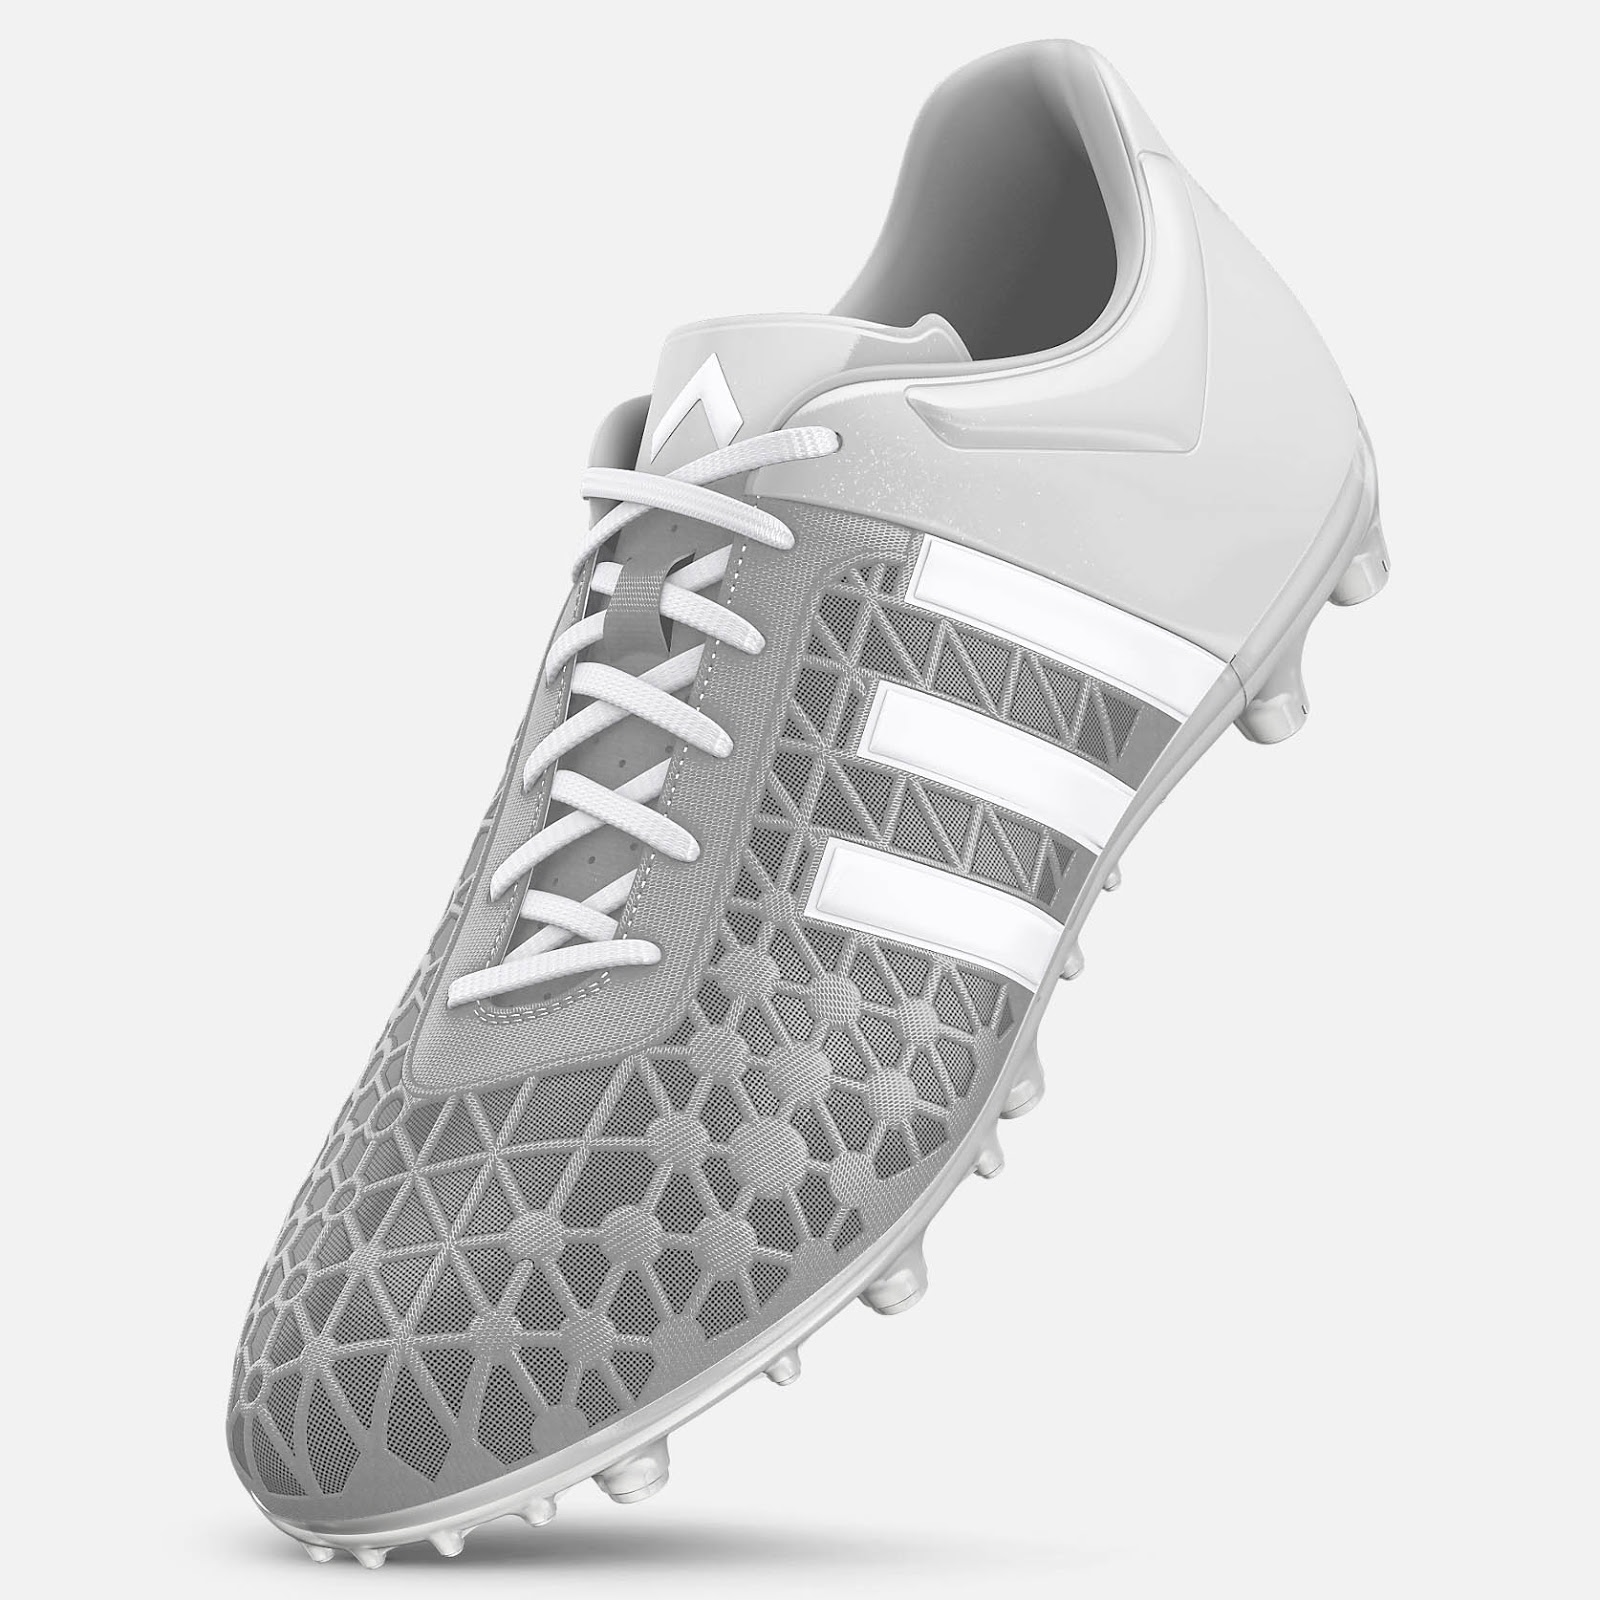 official photos 2bdfe 0da00 ... Custom Mi Adidas Ace 15.3 Indoor, Turf and Outdoor Boots ...